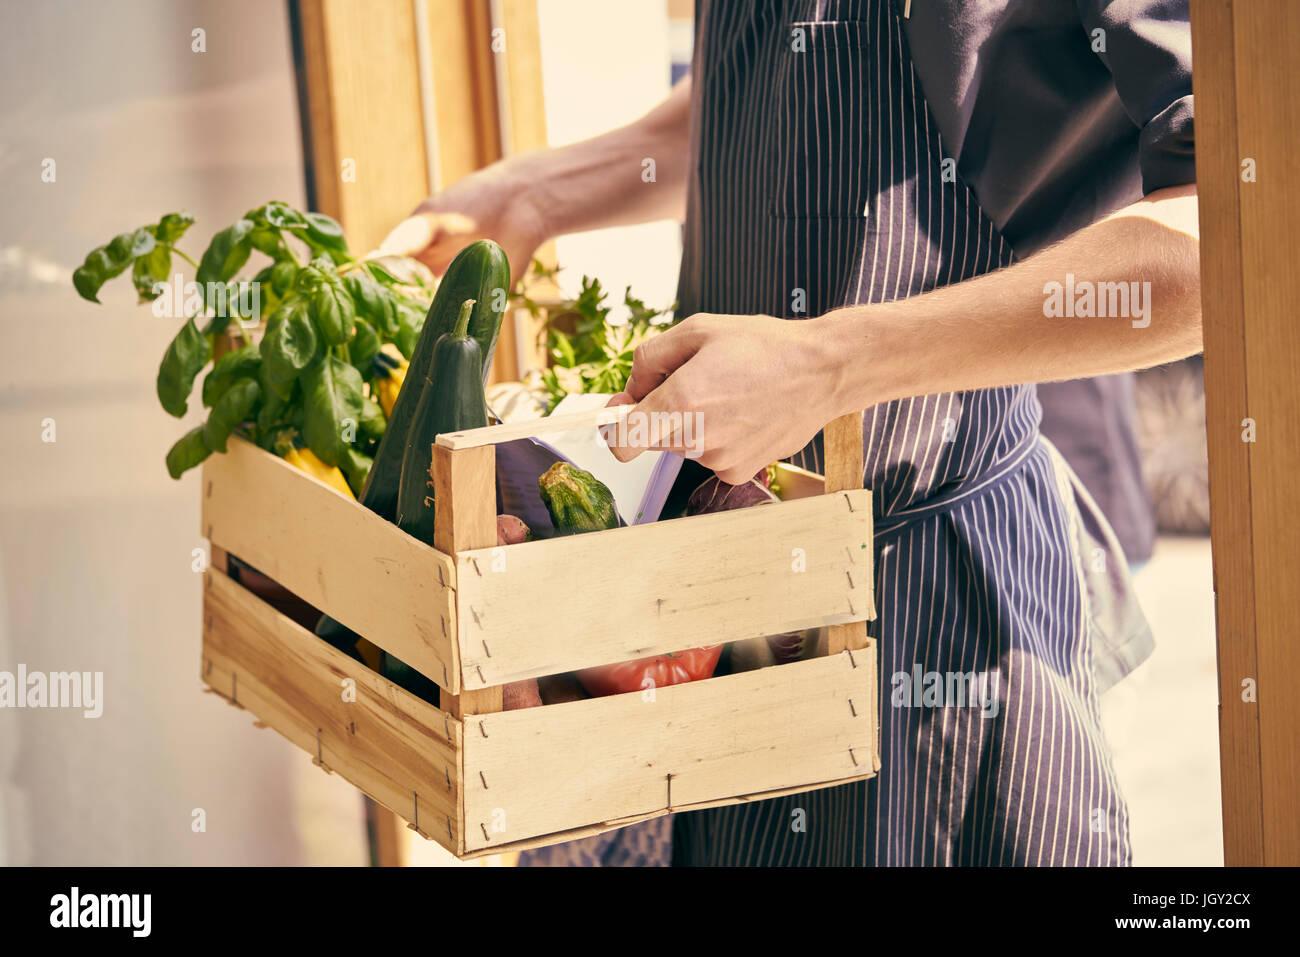 Beschnitten, Blick auf Koch Transport Kiste mit Gemüse Stockbild